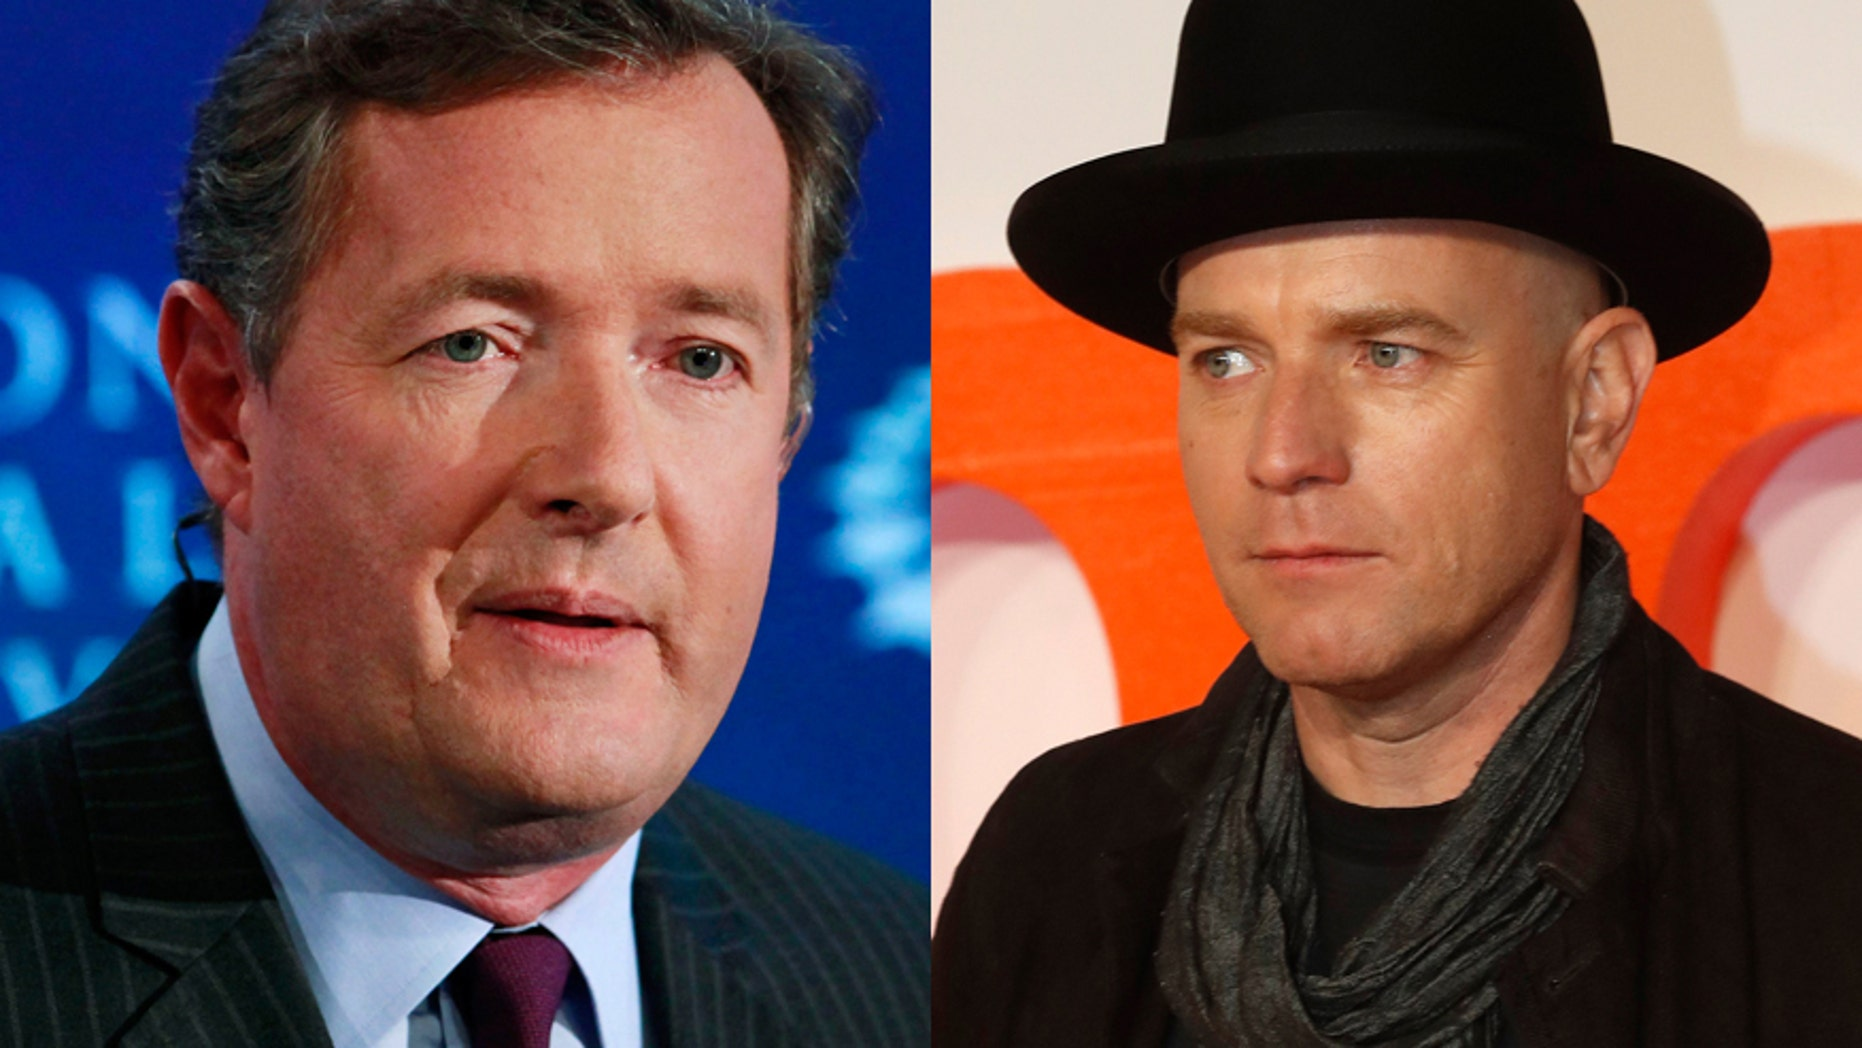 Piers Morgan (left) and actor Ewan McGregor.